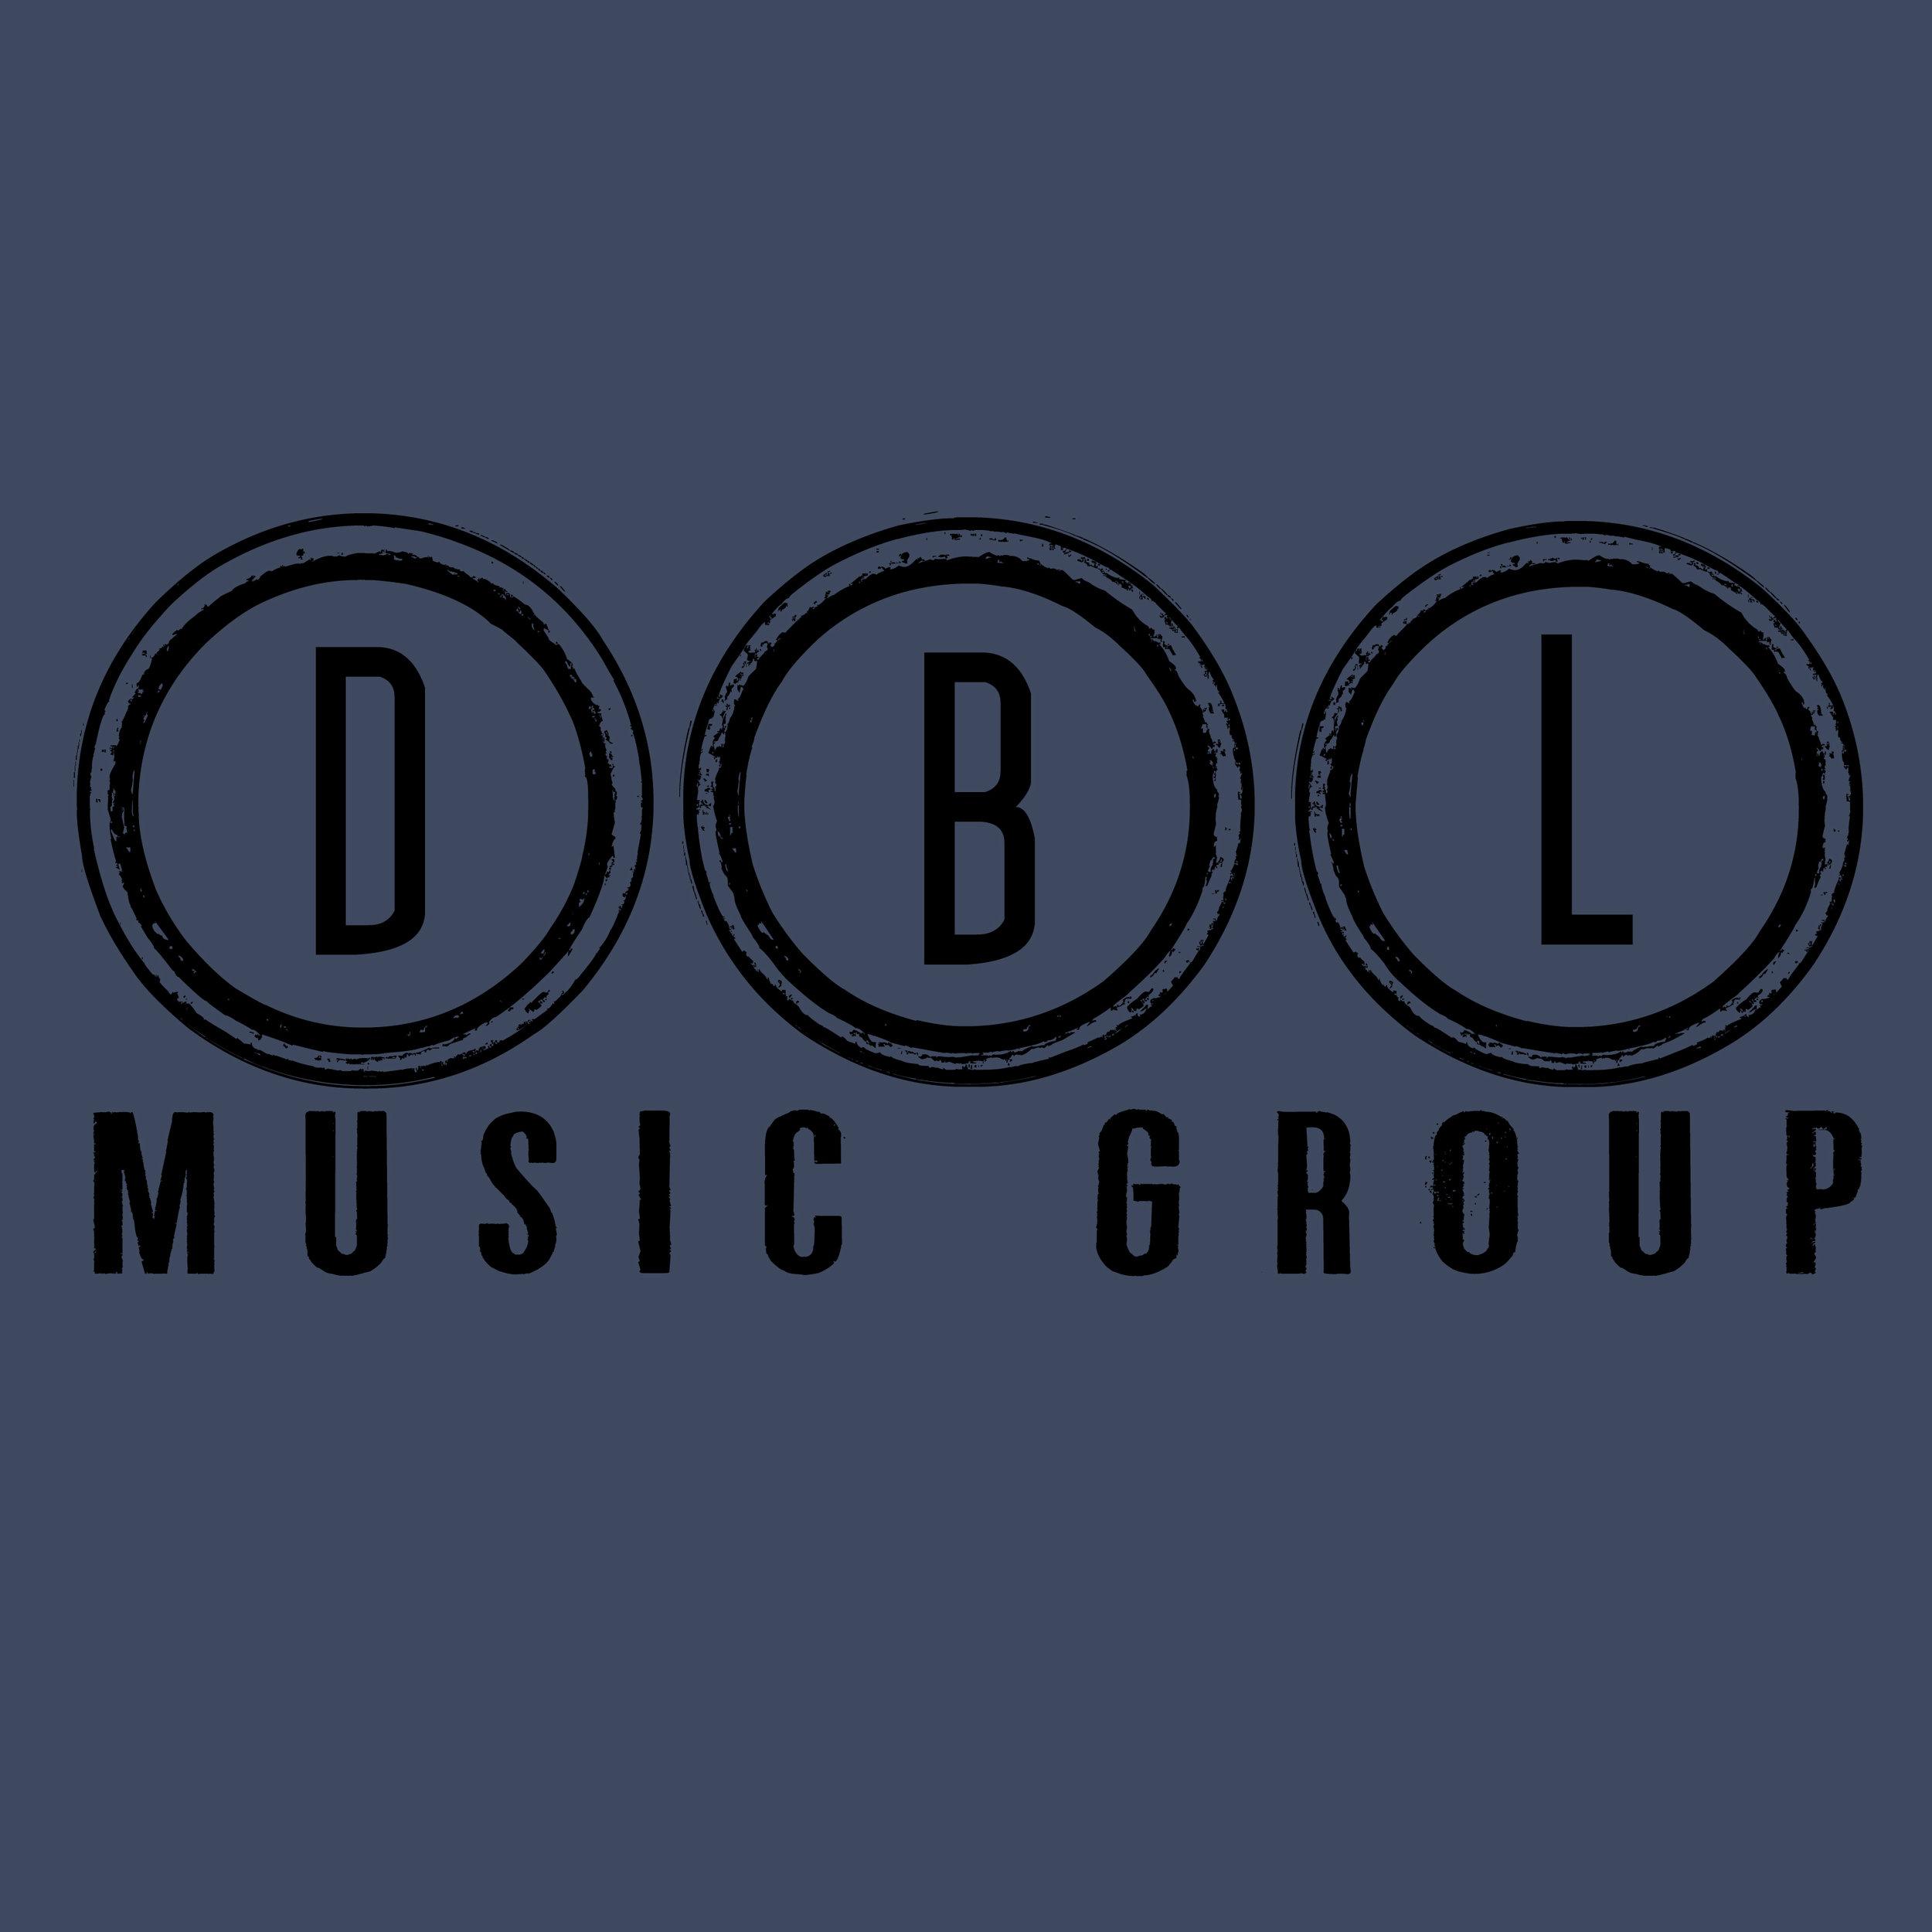 DBL MUSIC GROUP